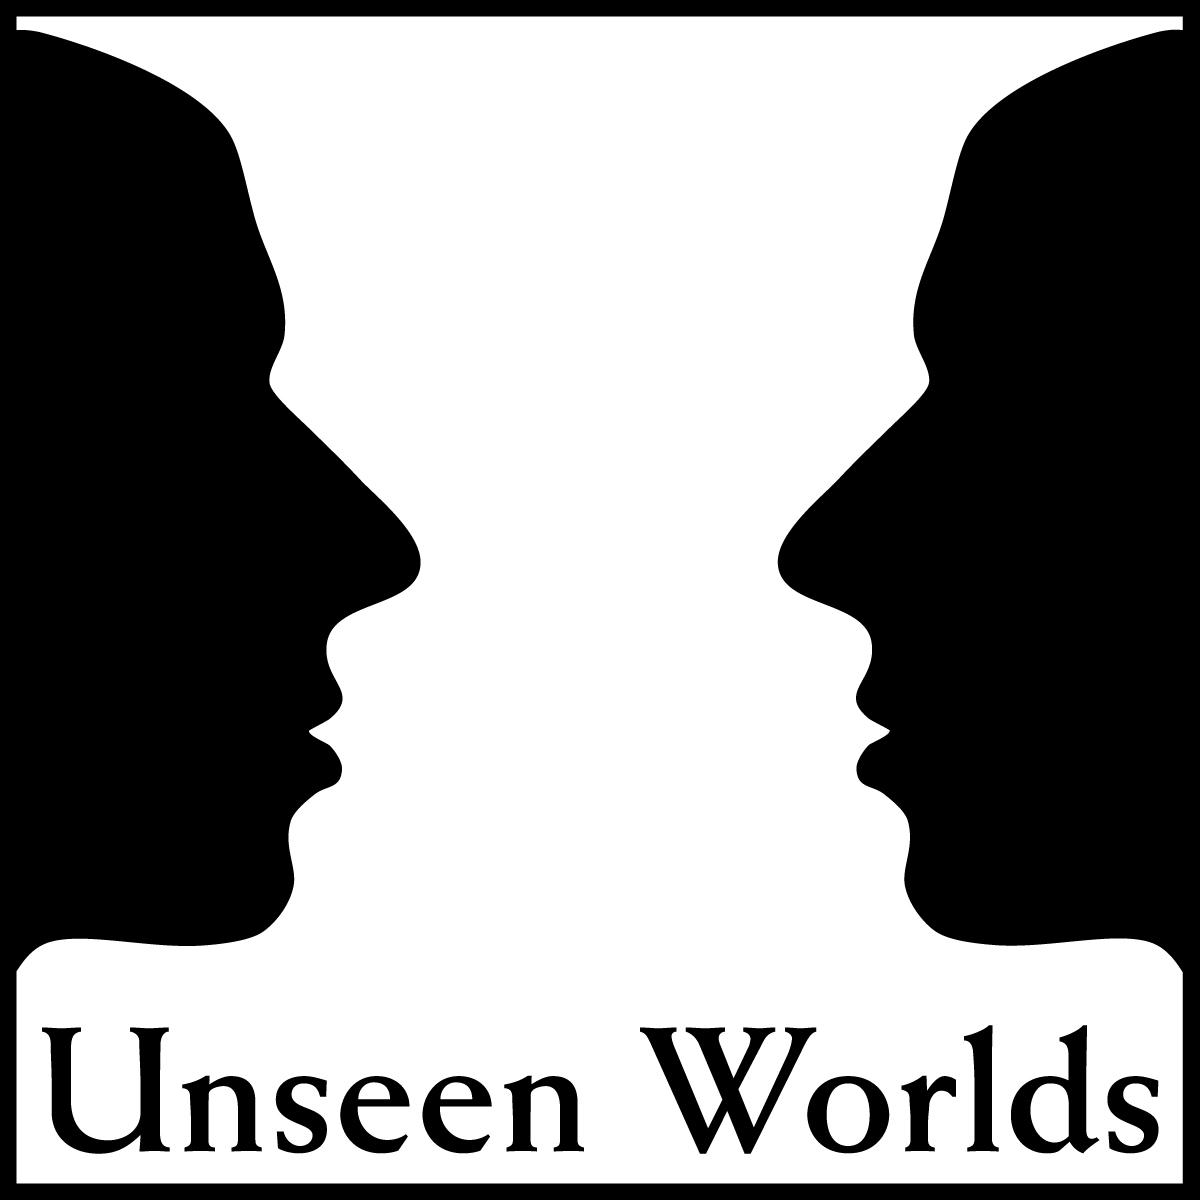 Unseen Worlds